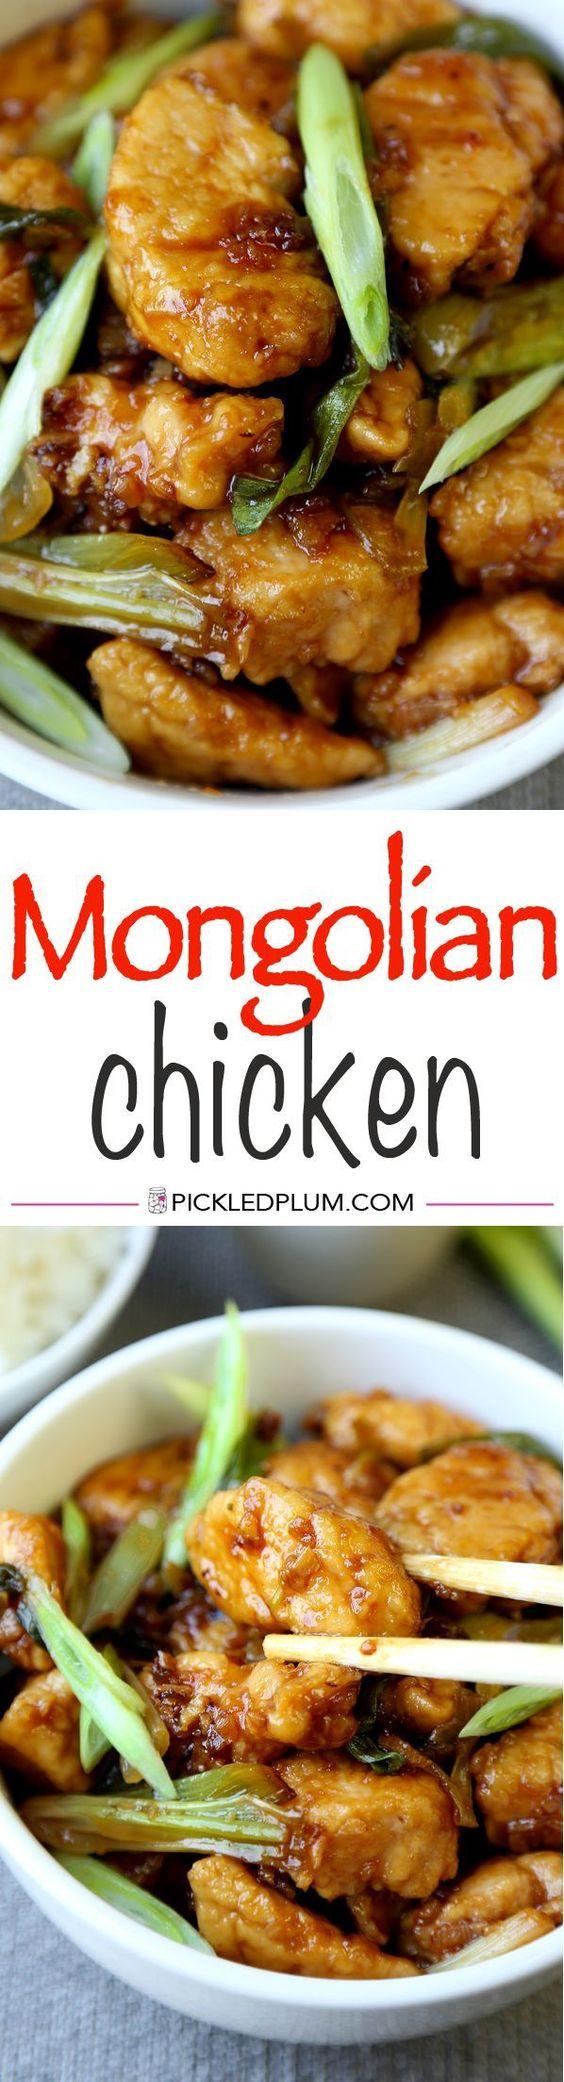 Quick chicken recipes pinterest